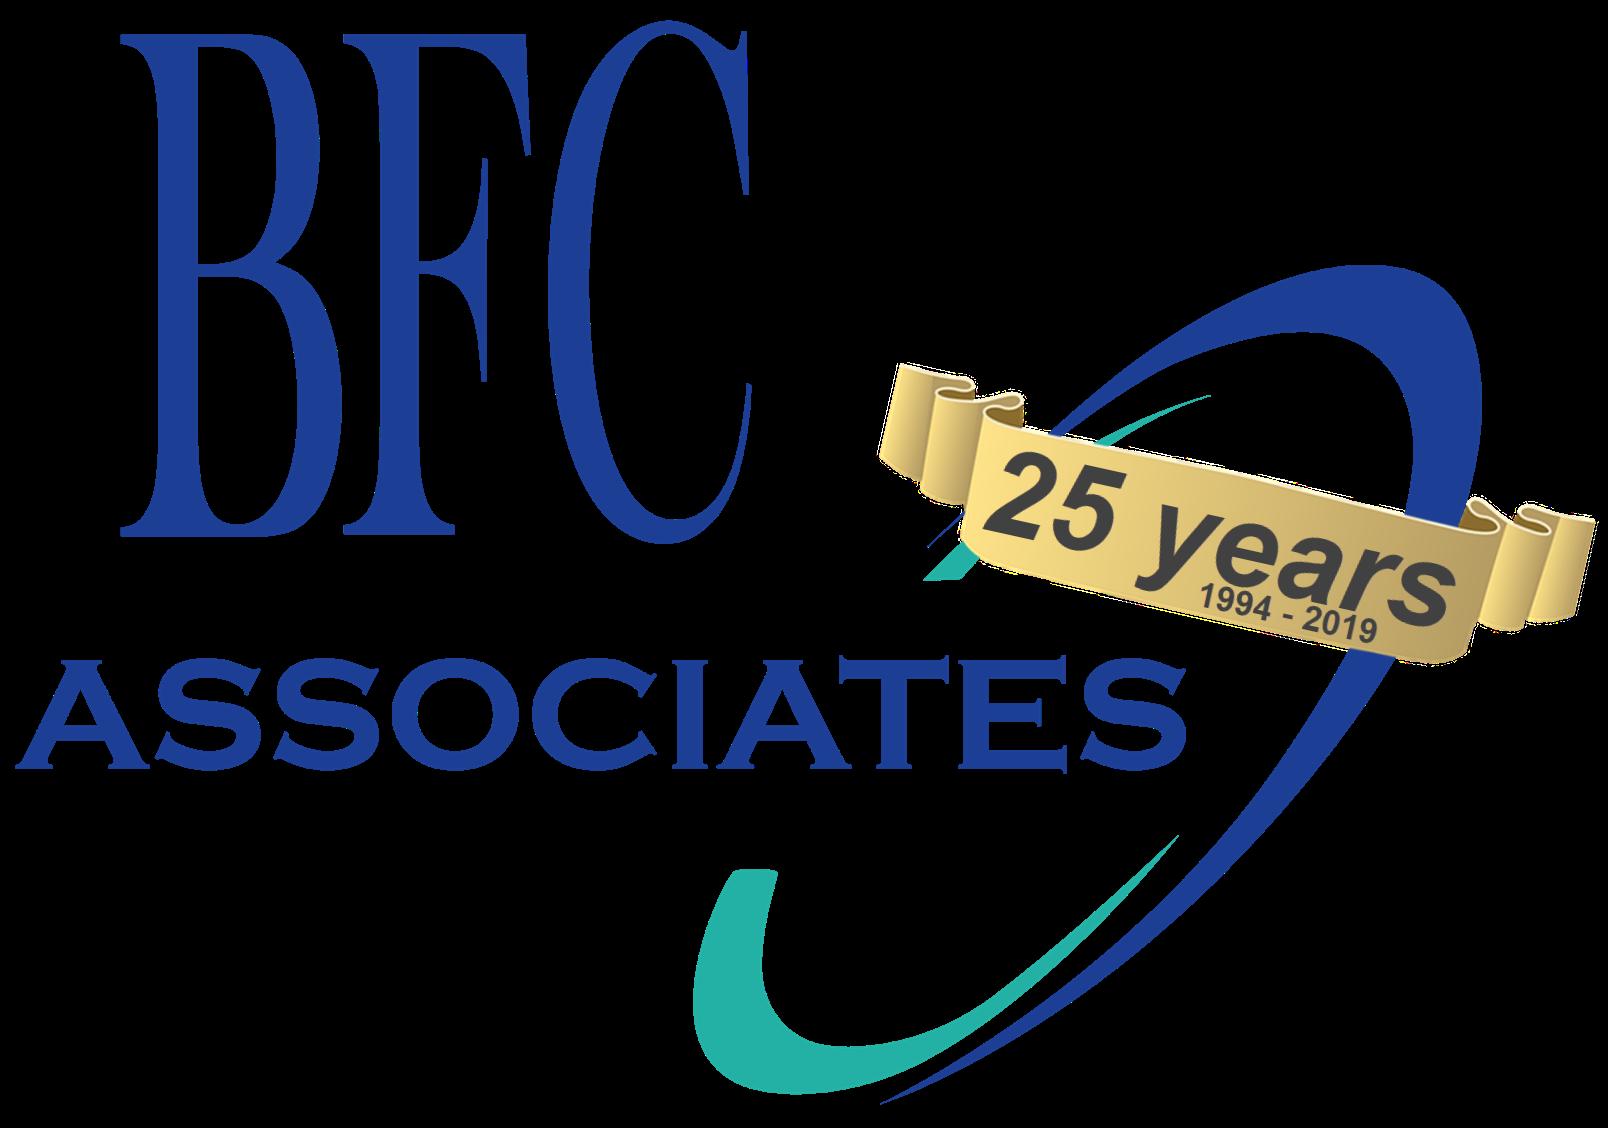 BFC Associates